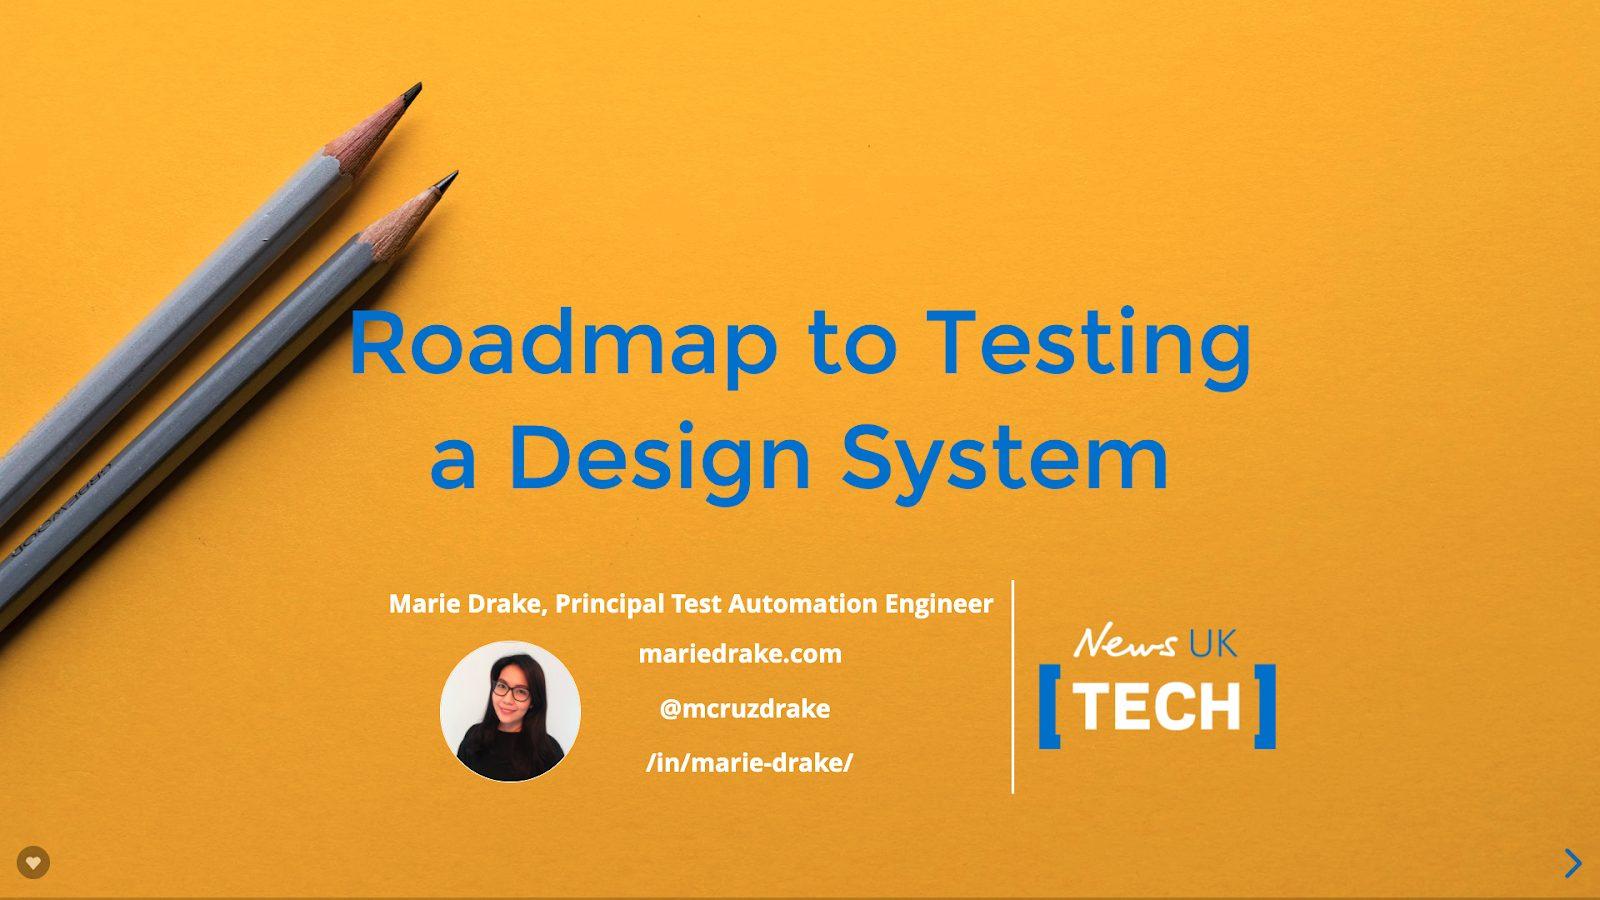 roadmap to testing